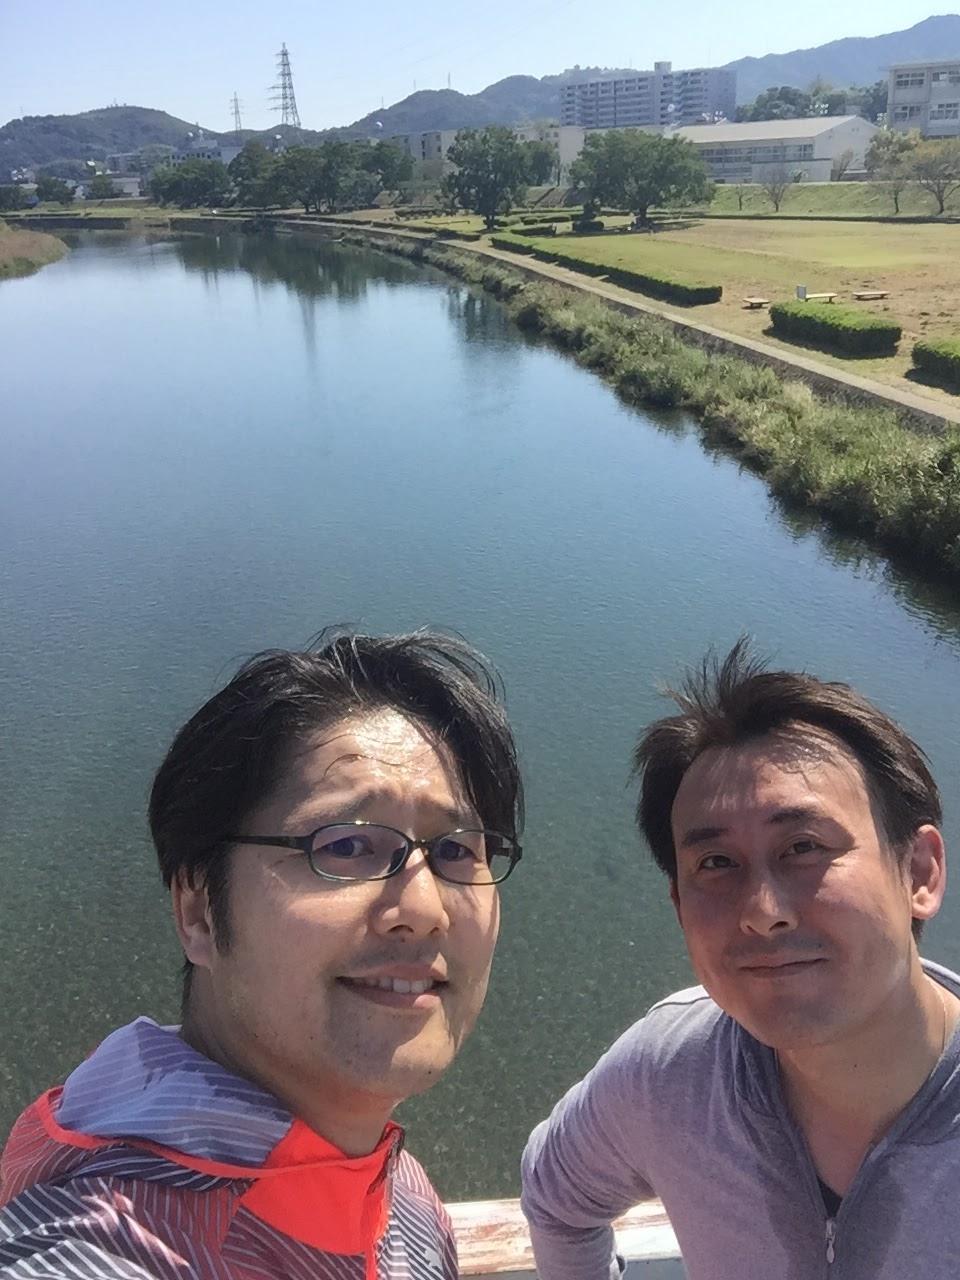 高知、鏡川。本当に綺麗!